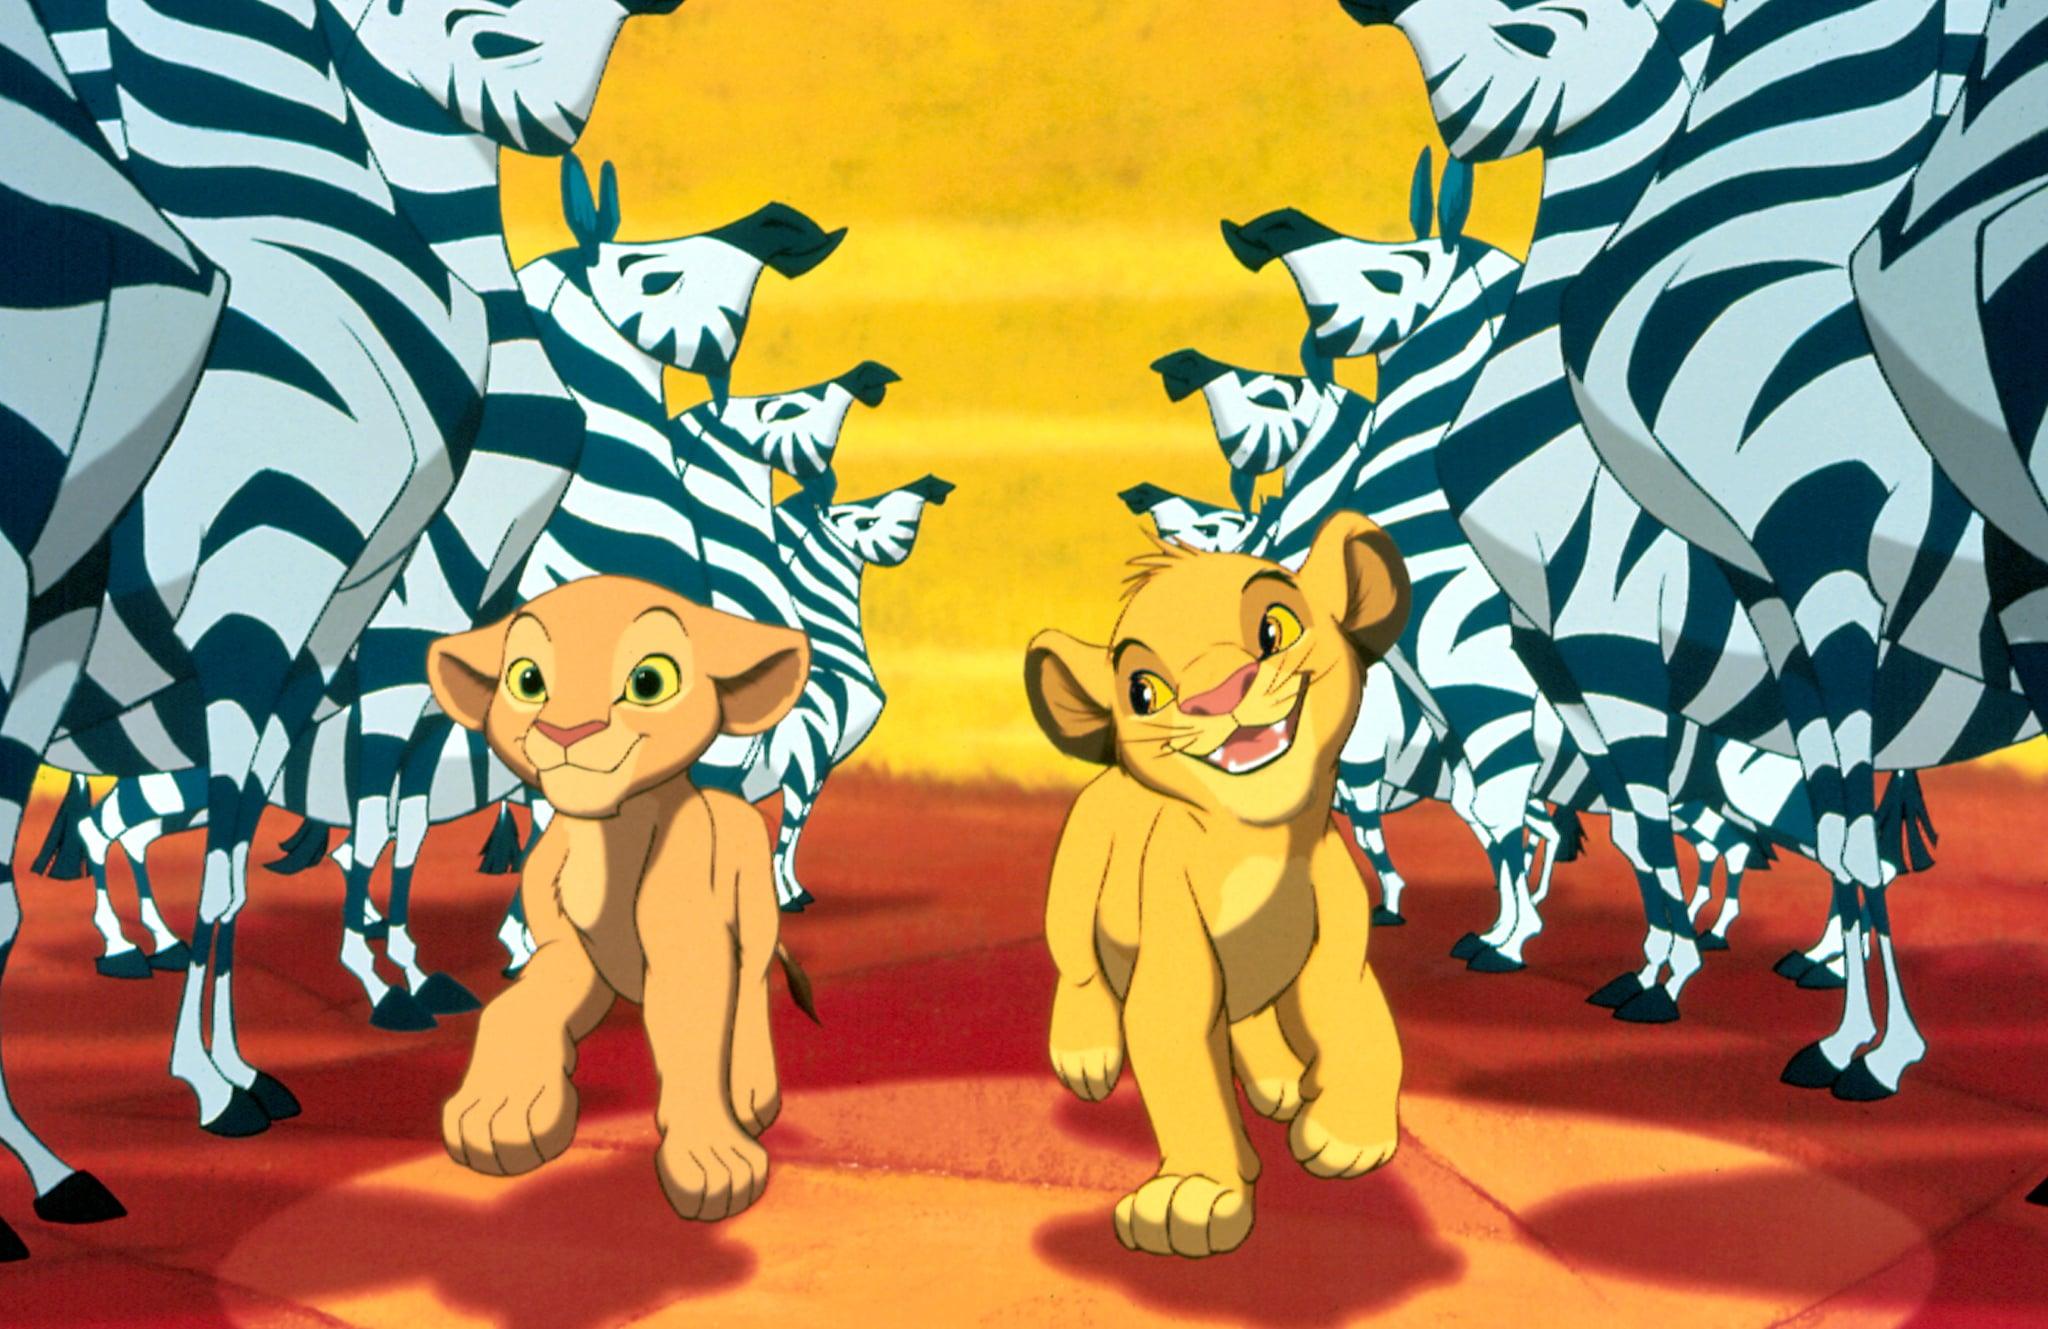 THE LION KING, Nala, Simba, 1994. Buena Vista Pictures/Courtesy Everett Collection